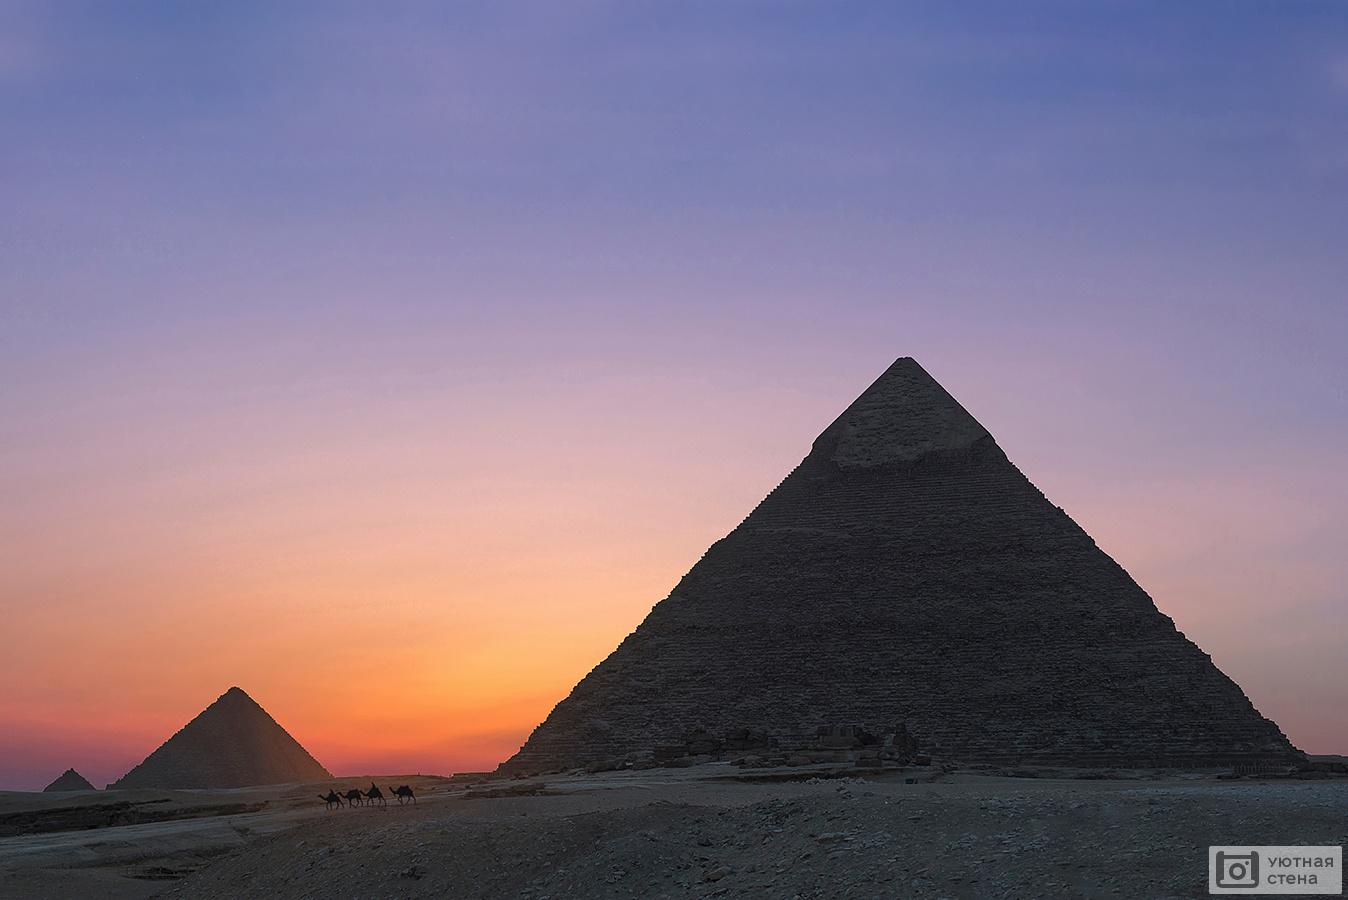 всех выше пирамида на фотообоях фото руки